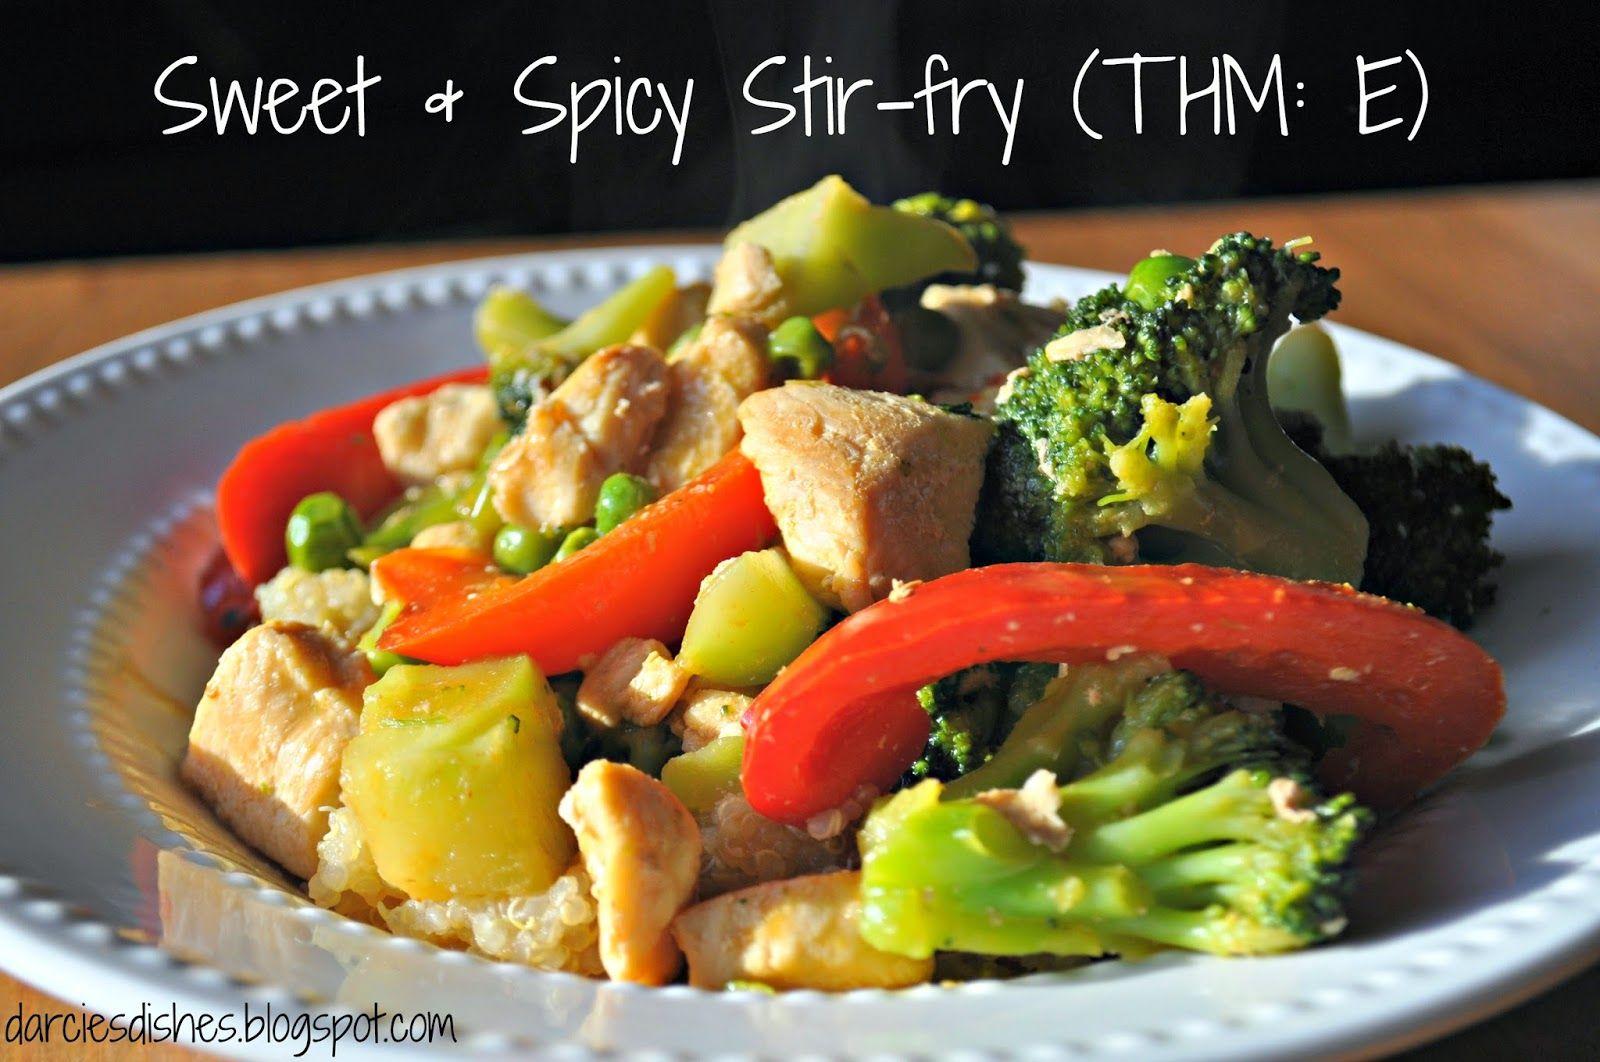 Darcie's Dishes: Sweet and Spicy Stir-fry (E) #thm #trimhealthymama #emeal #stir-fry